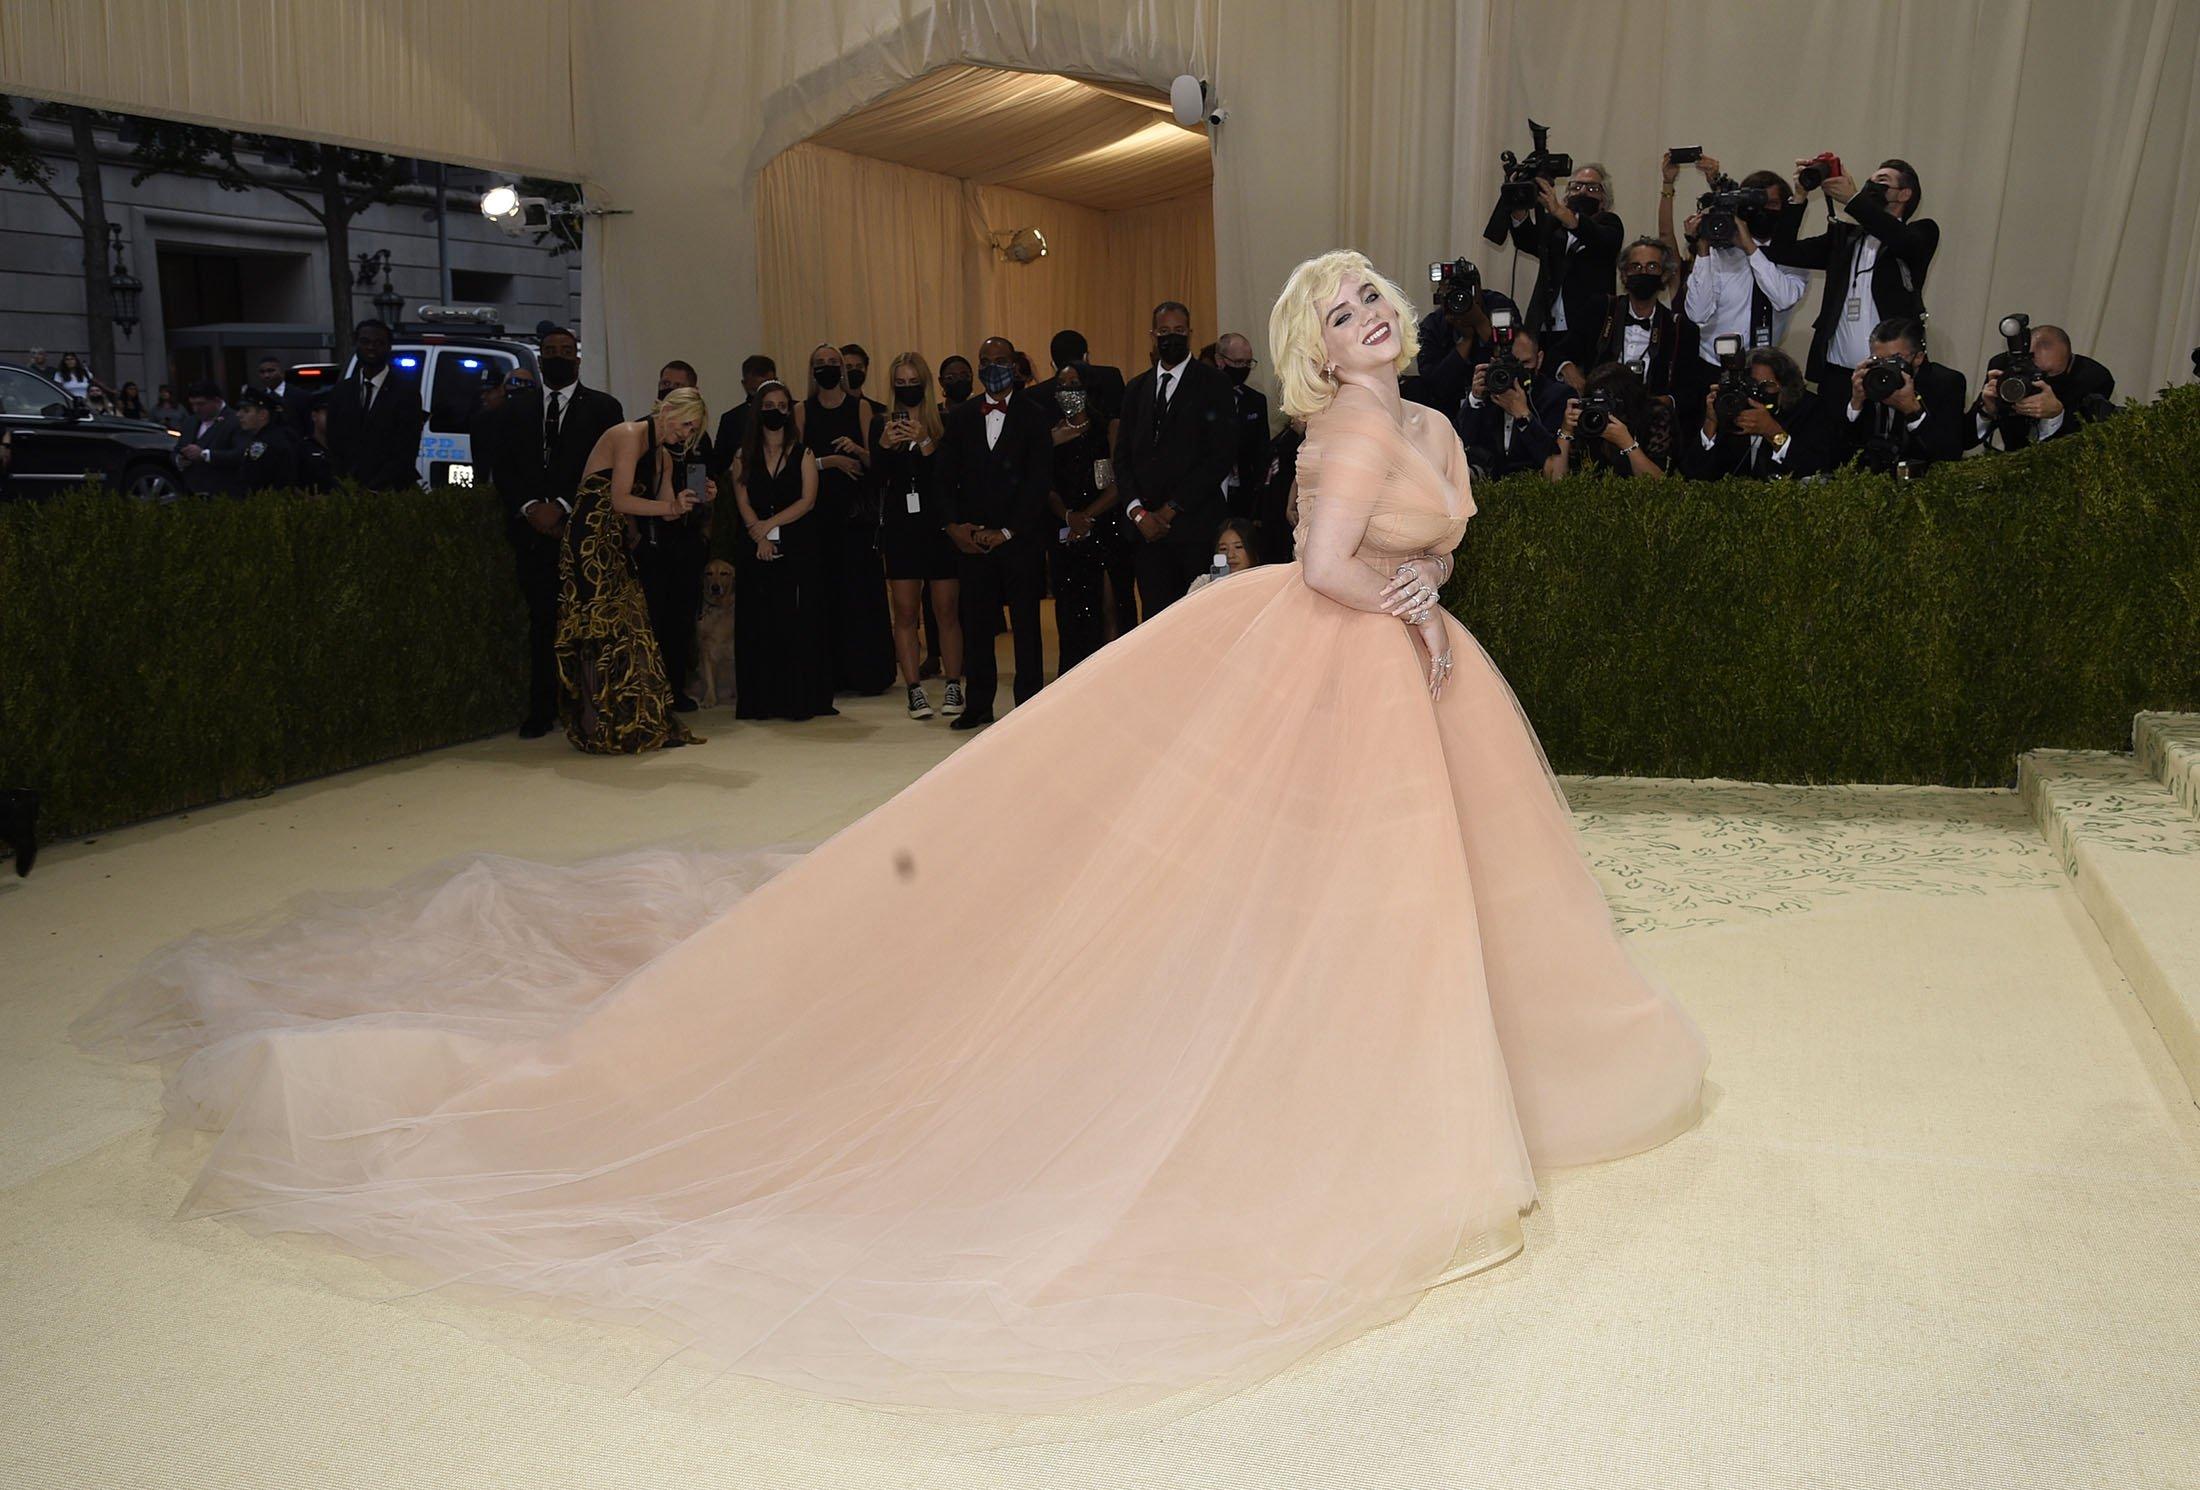 Billie Eilish arrives for the 2021 Met Gala at the Metropolitan Museum of Art, in New York, U.S., Sept. 13, 2021. (AP Photo)